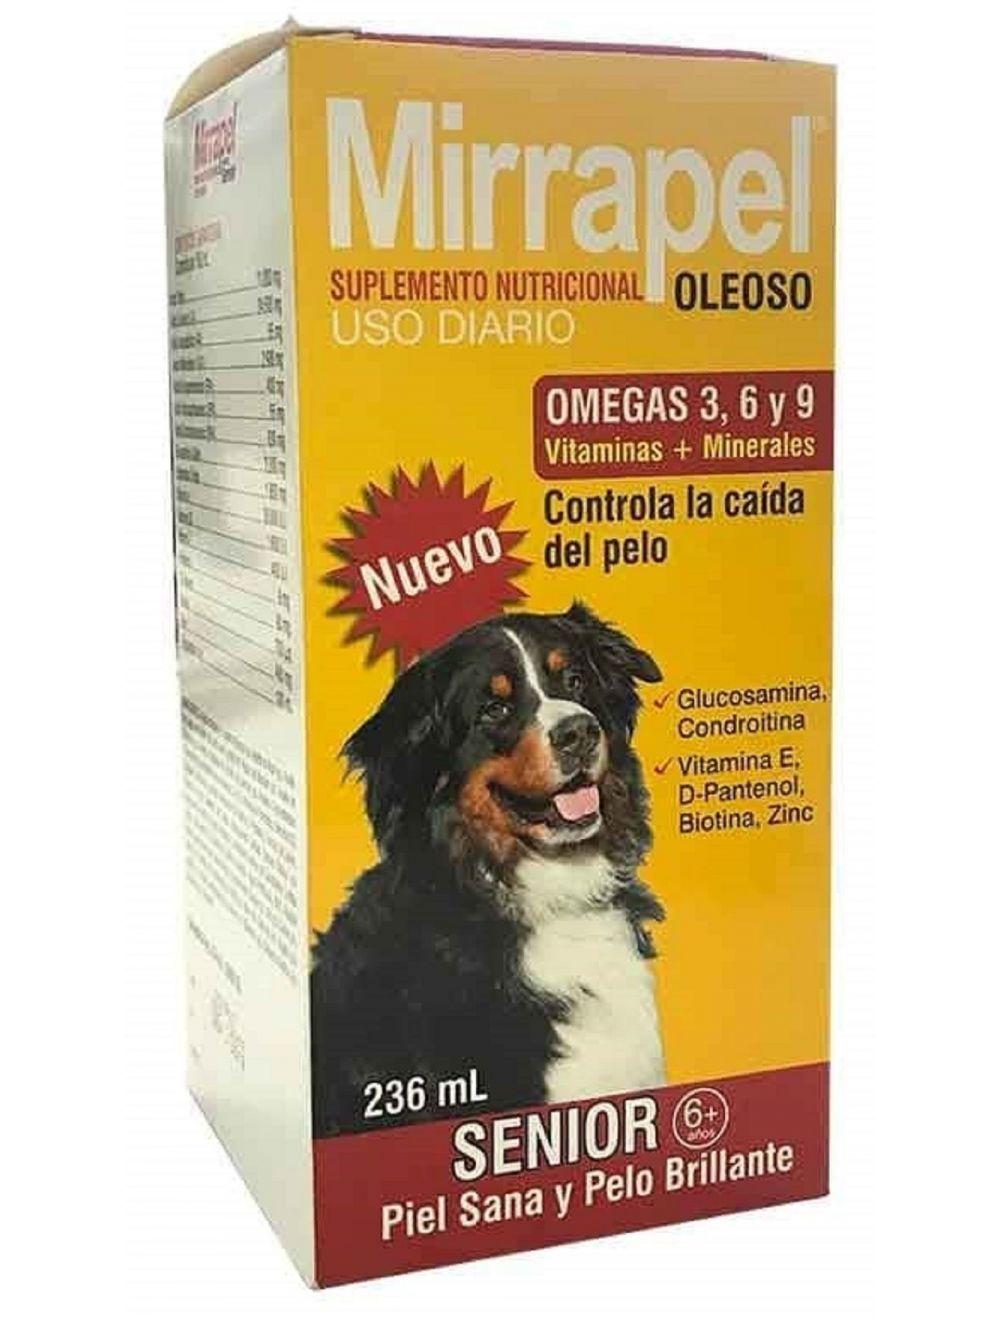 Mirrapel Perros Senior x 236 ml